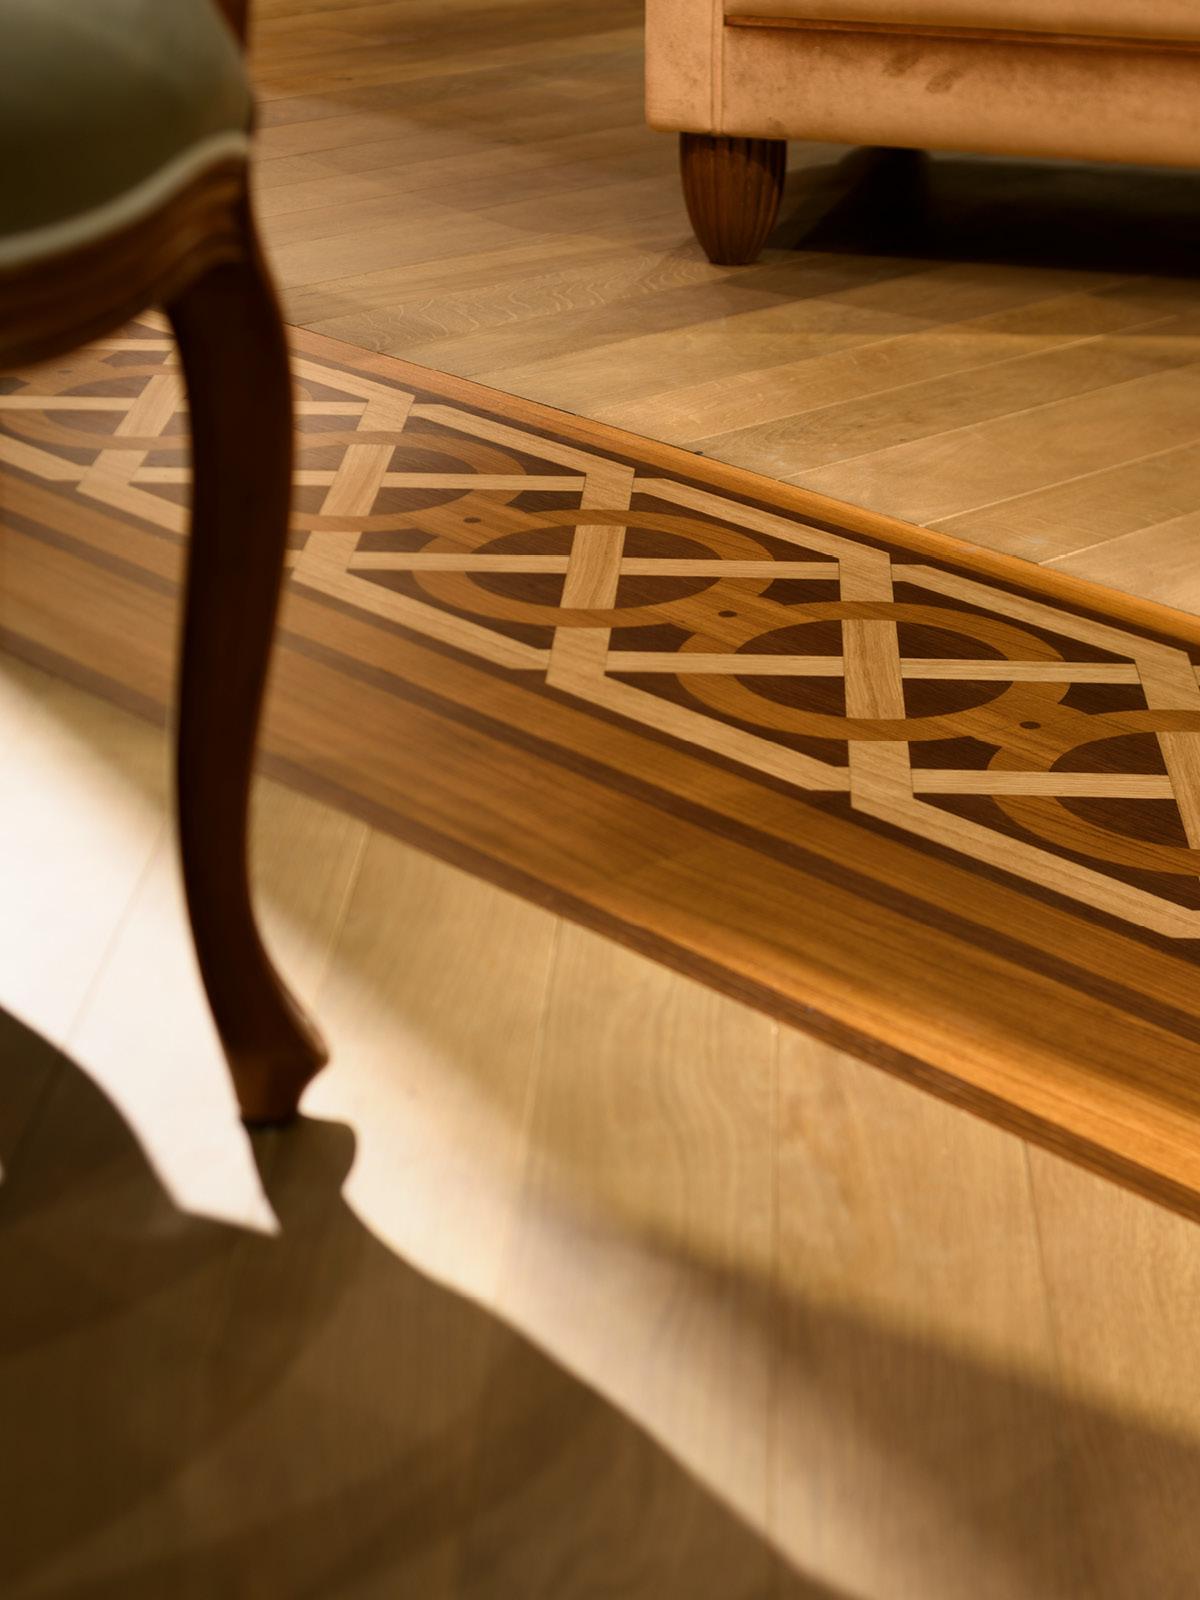 Inlay detail in flooring